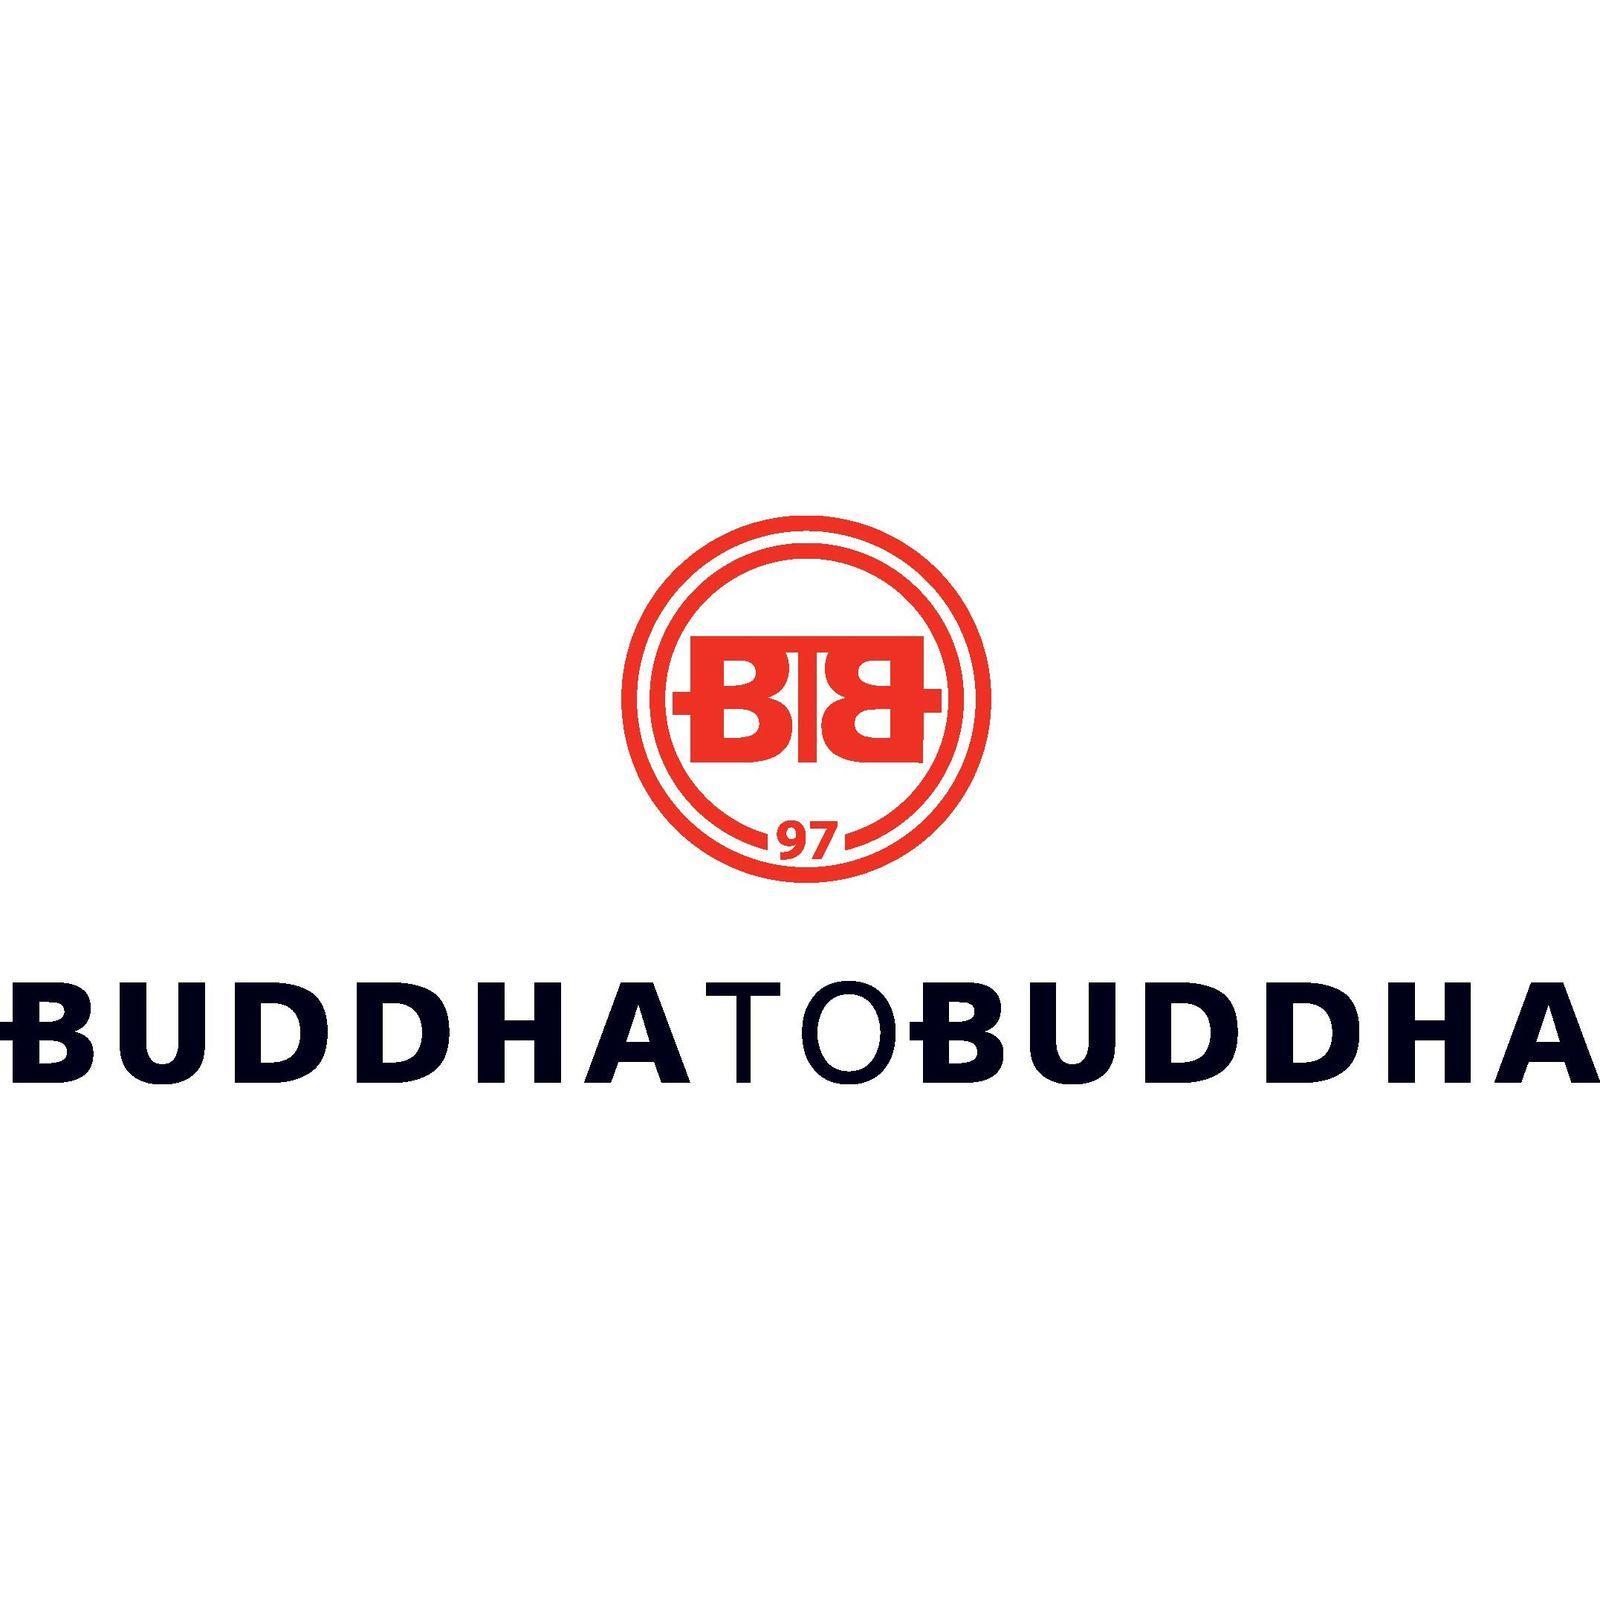 BUDDHA TO BUDDHA (Afbeelding 1)